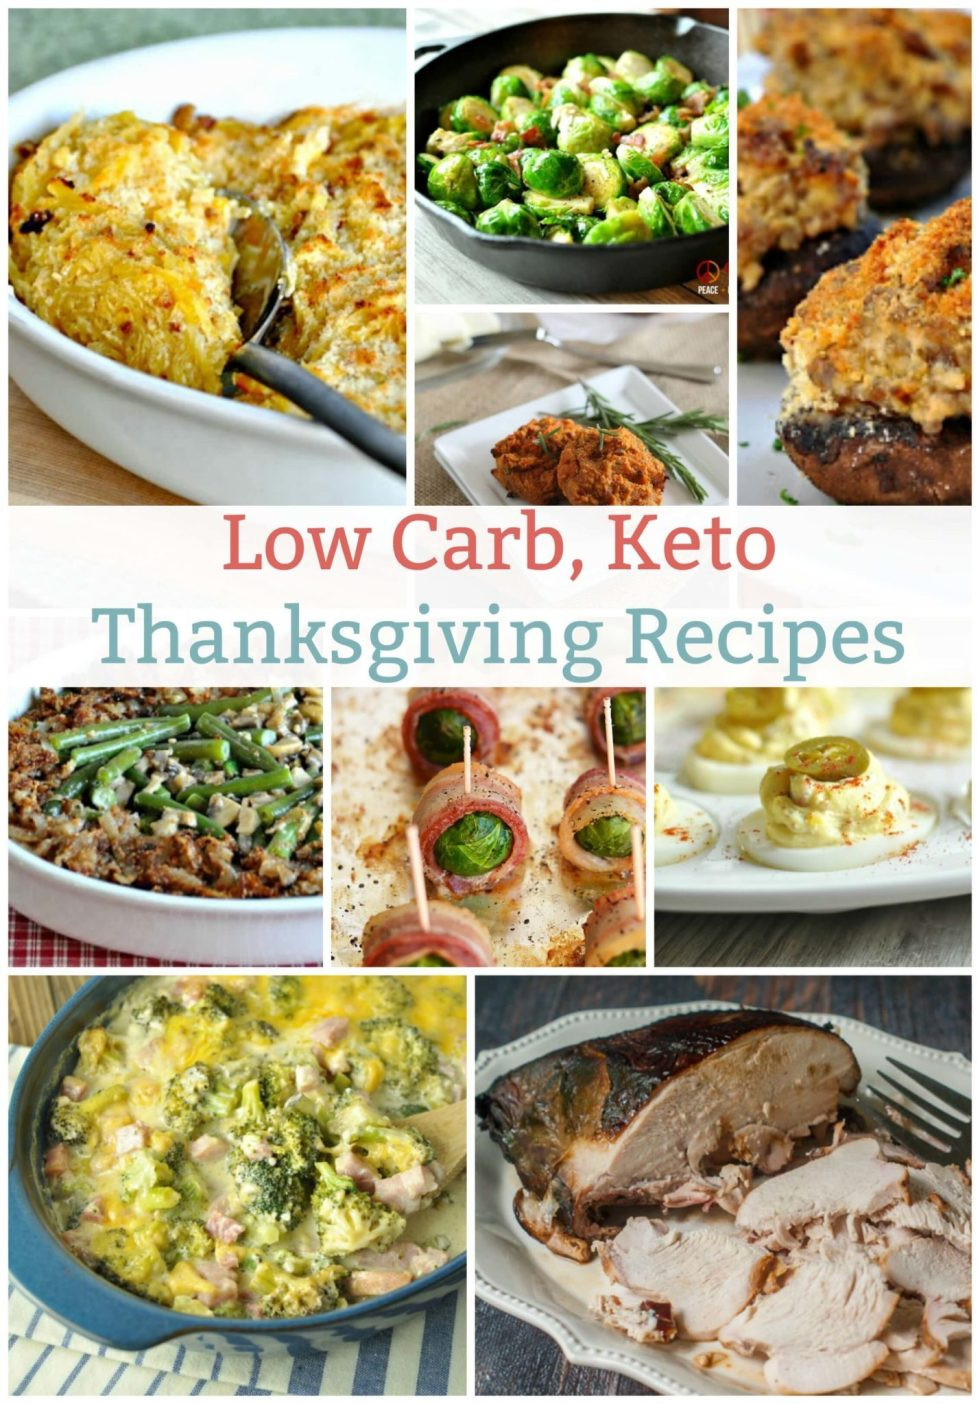 Low Carb Thanksgiving Desserts  Low Carb Keto Thanksgiving Recipes